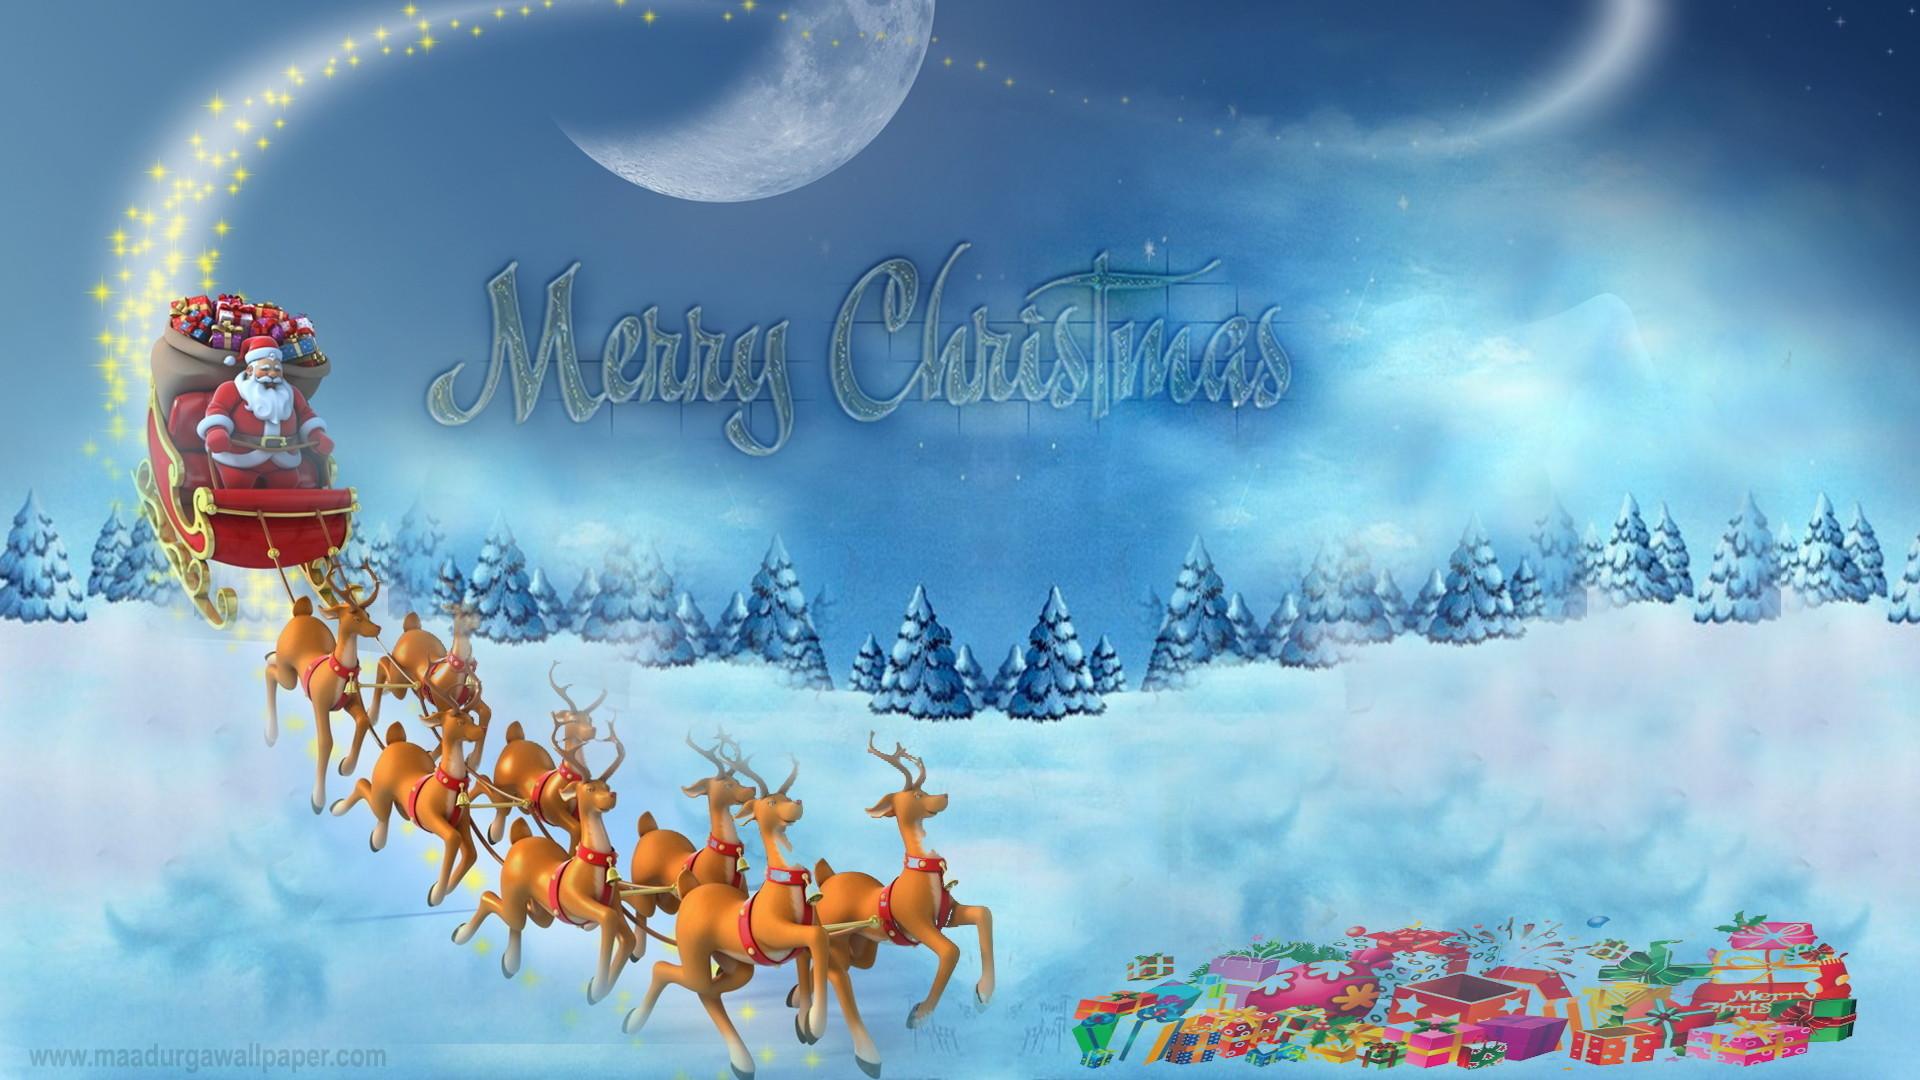 Christmas Wallpaper and Screensavers (60+ images)